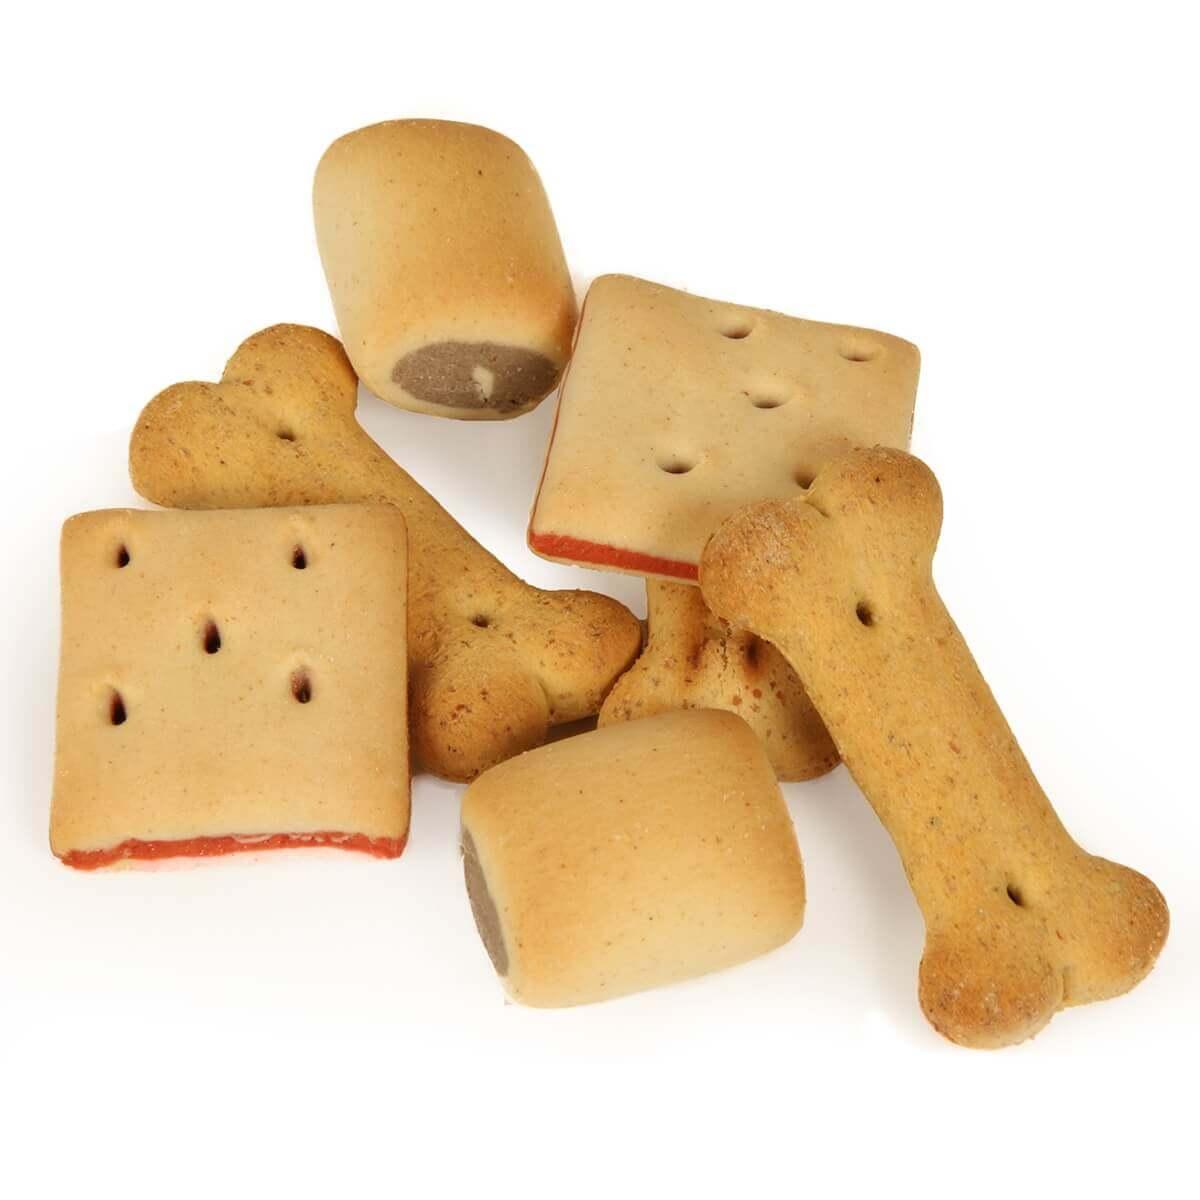 Biscuits assortis DAILYS pour chien 1kg_1